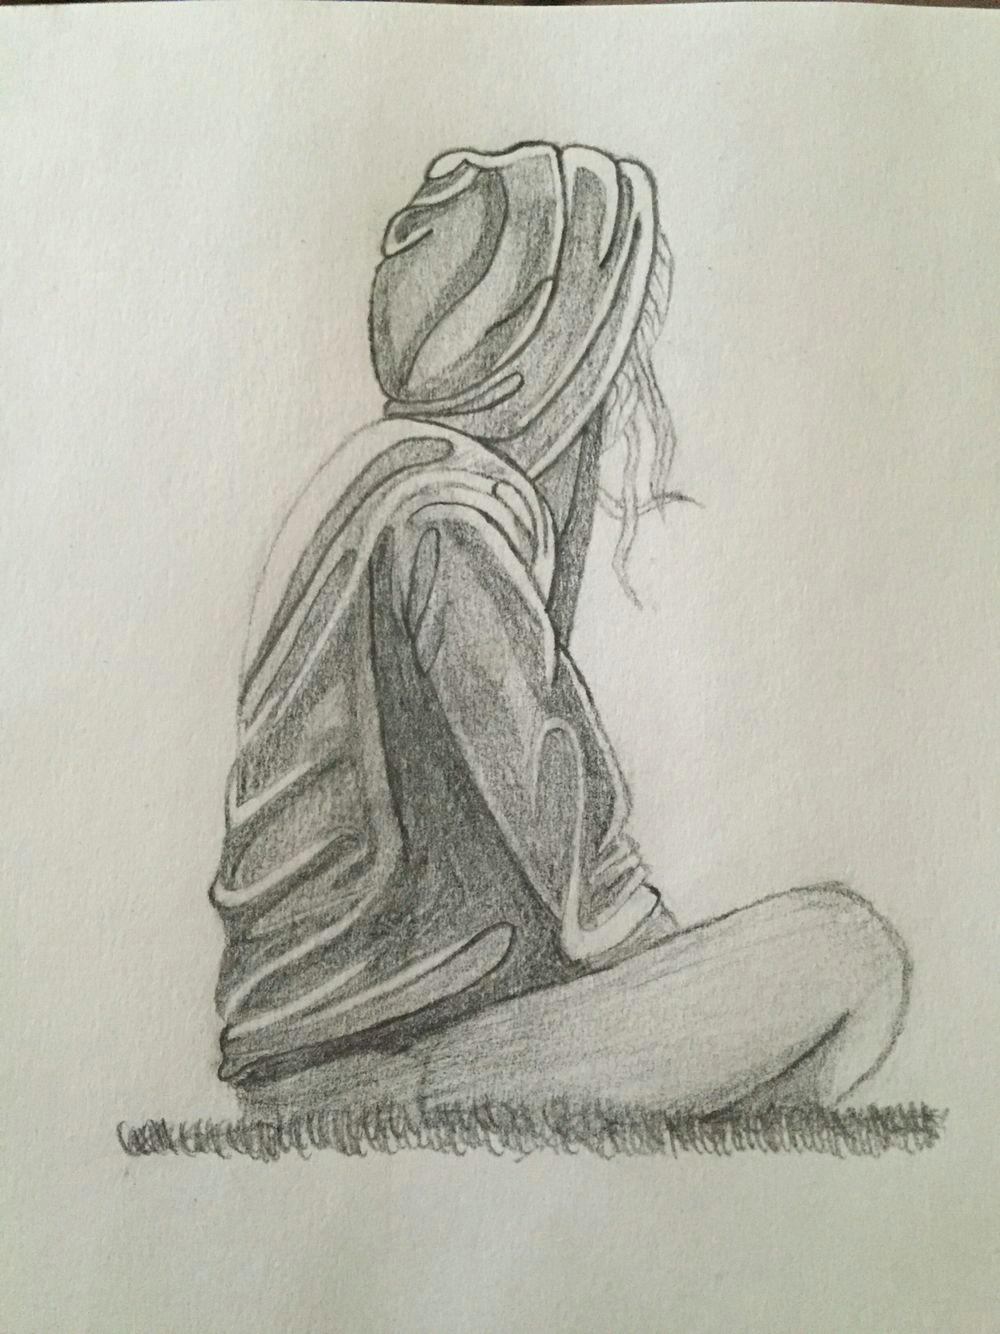 Drawings Of Girl Depressed Depression Sketch Depression Drawings Pencil Drawings Sketches